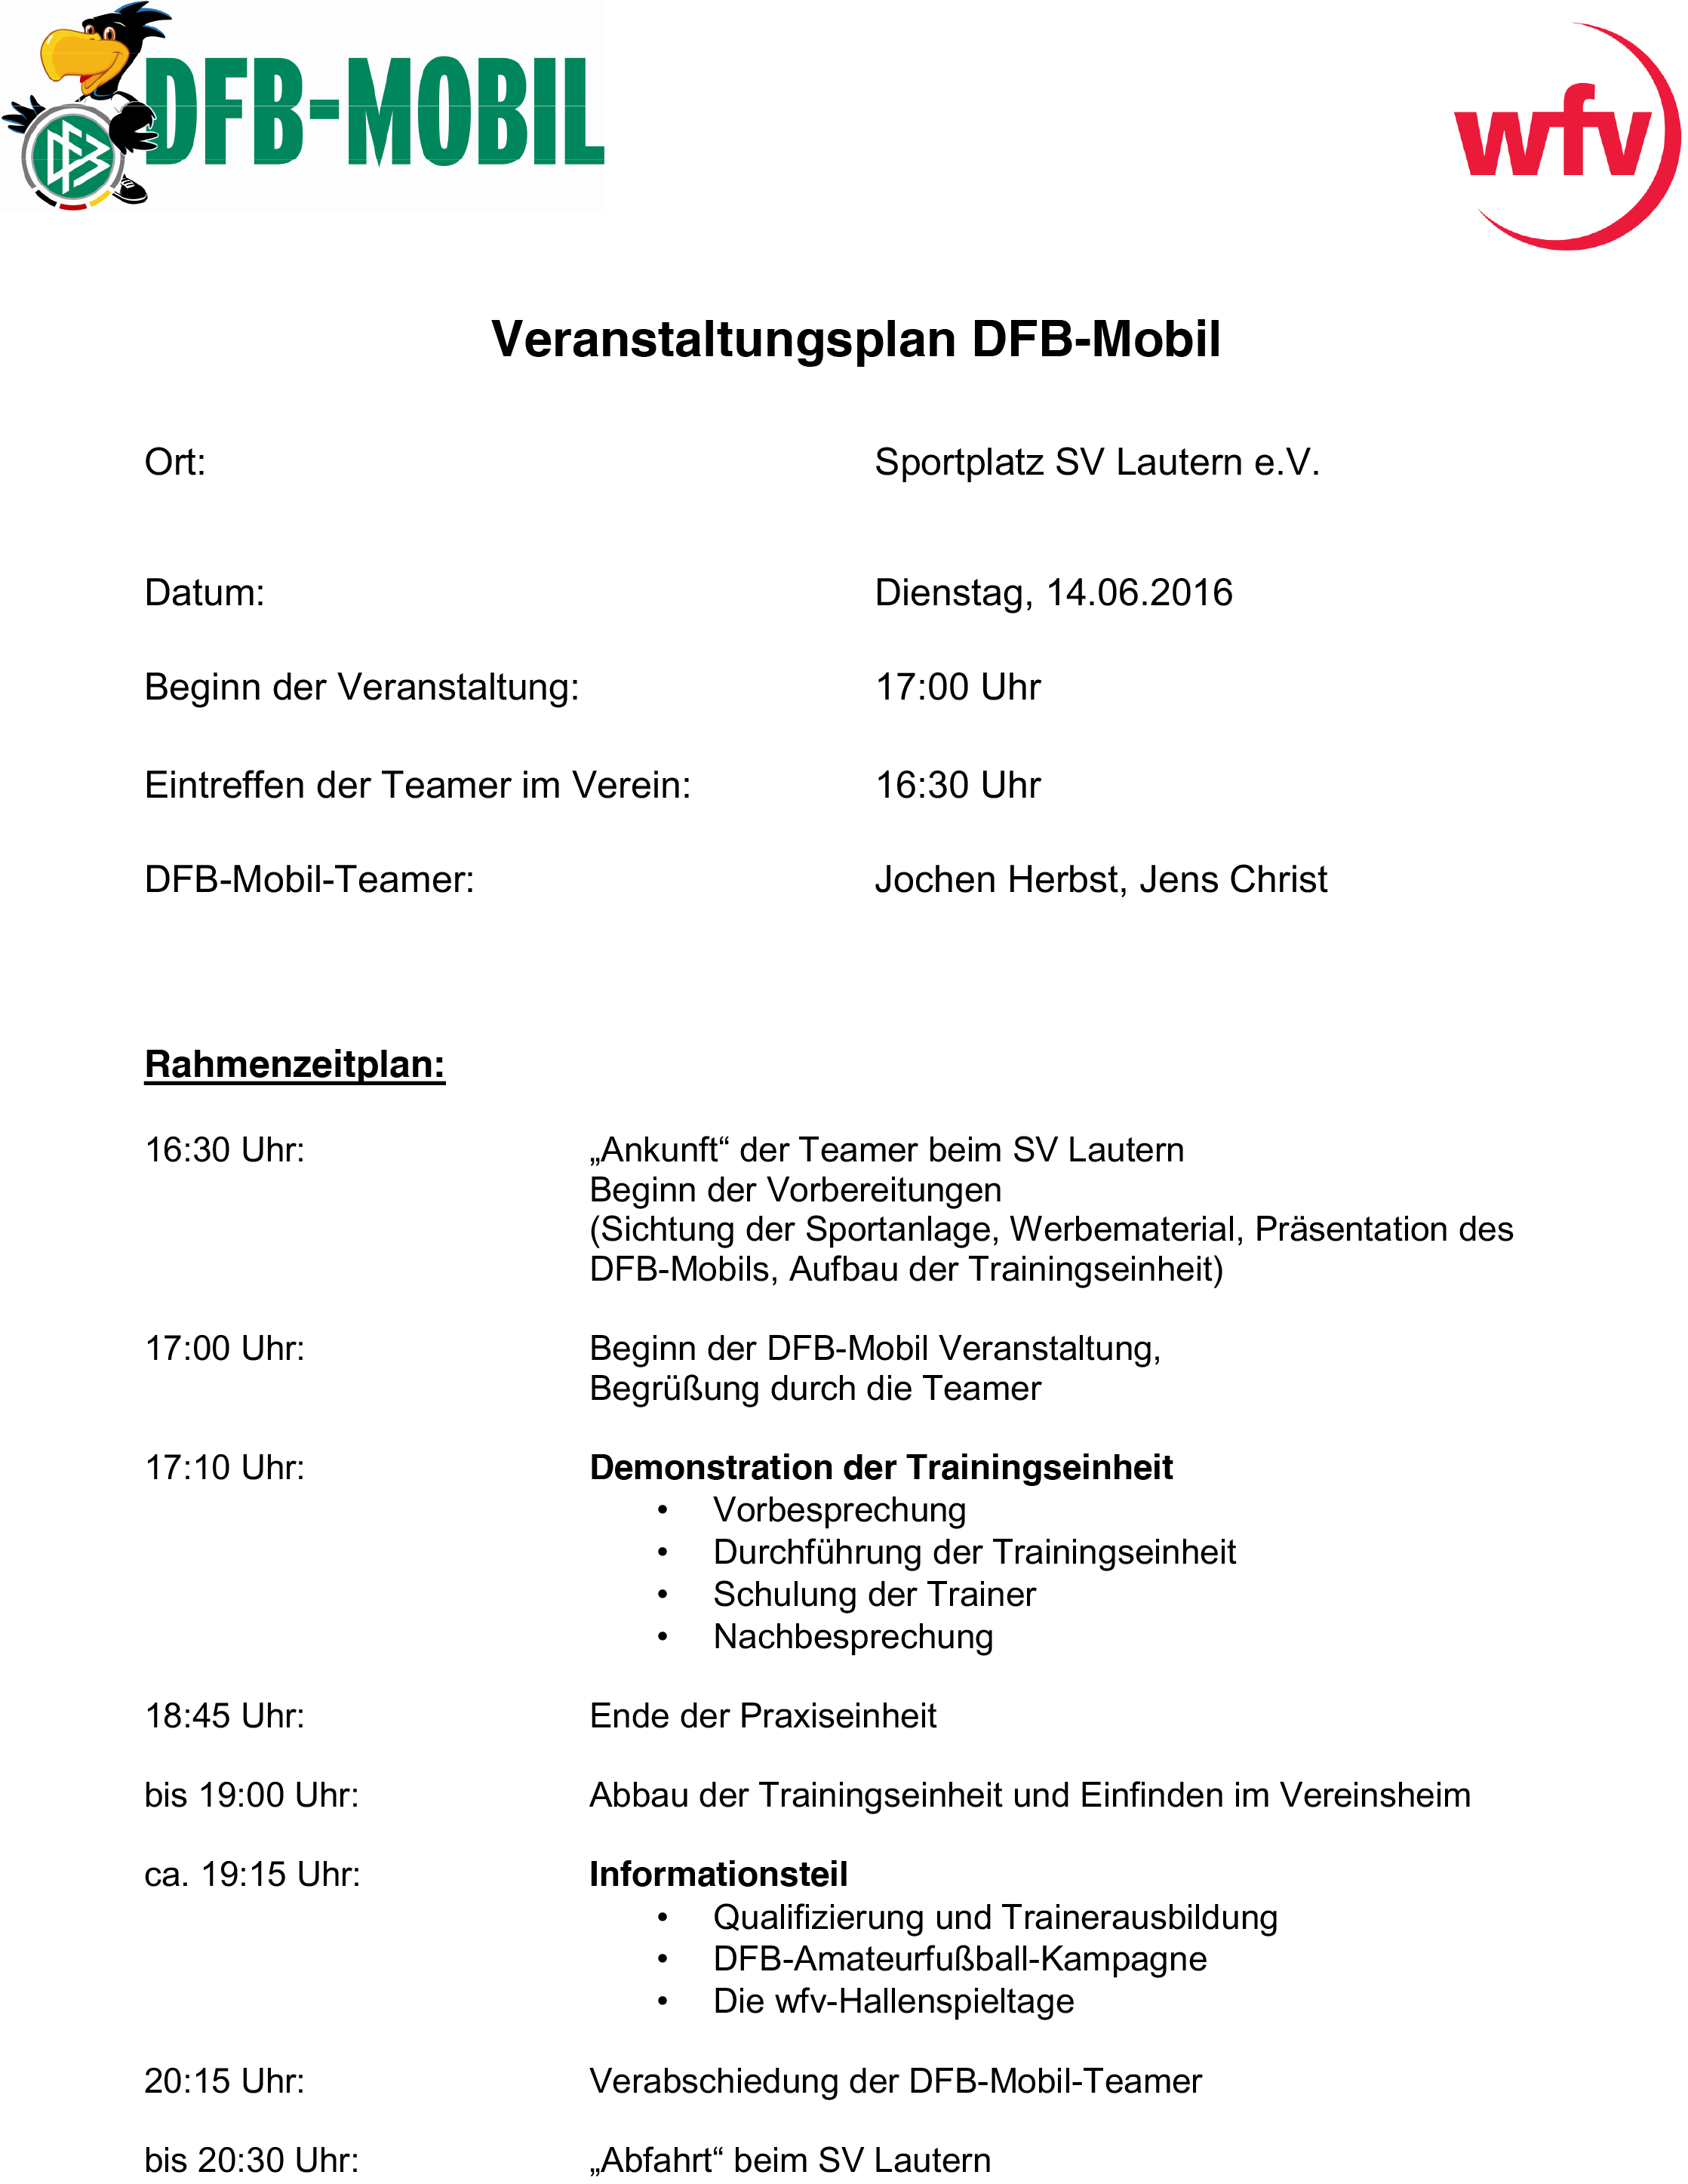 Veranstaltungsplan DFB-Mobil SV Lautern